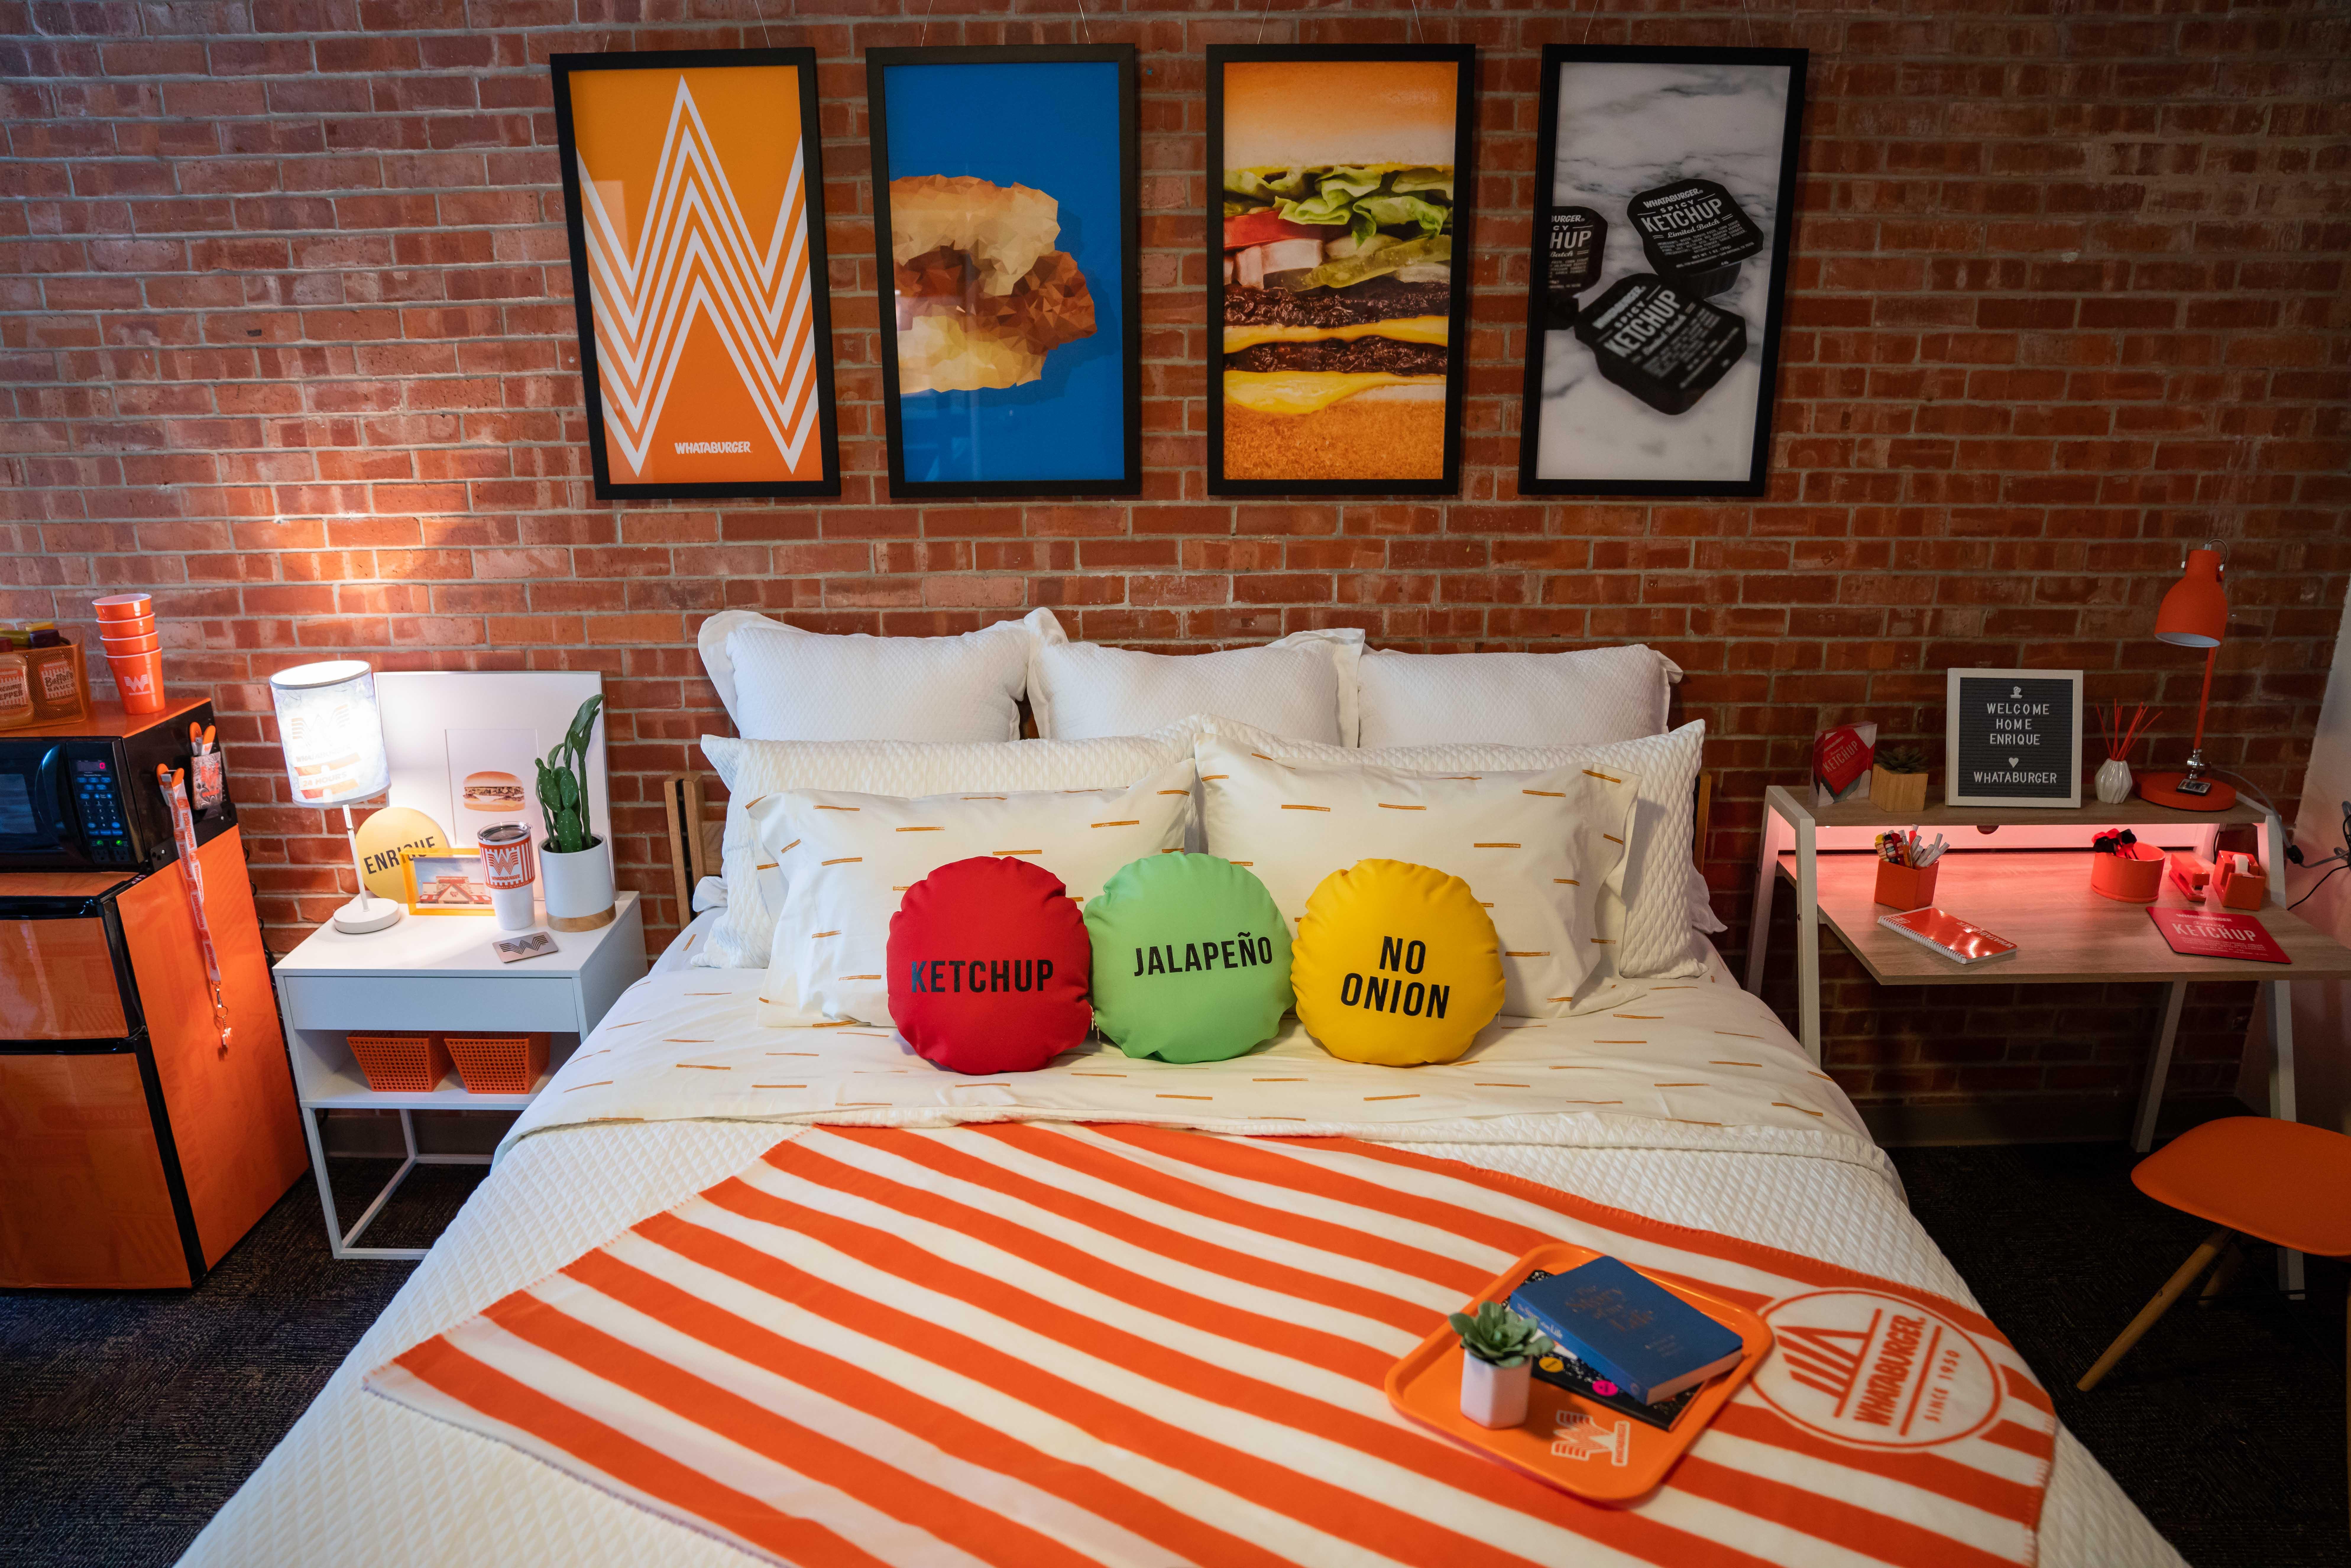 Whataburger's dorm room remodel